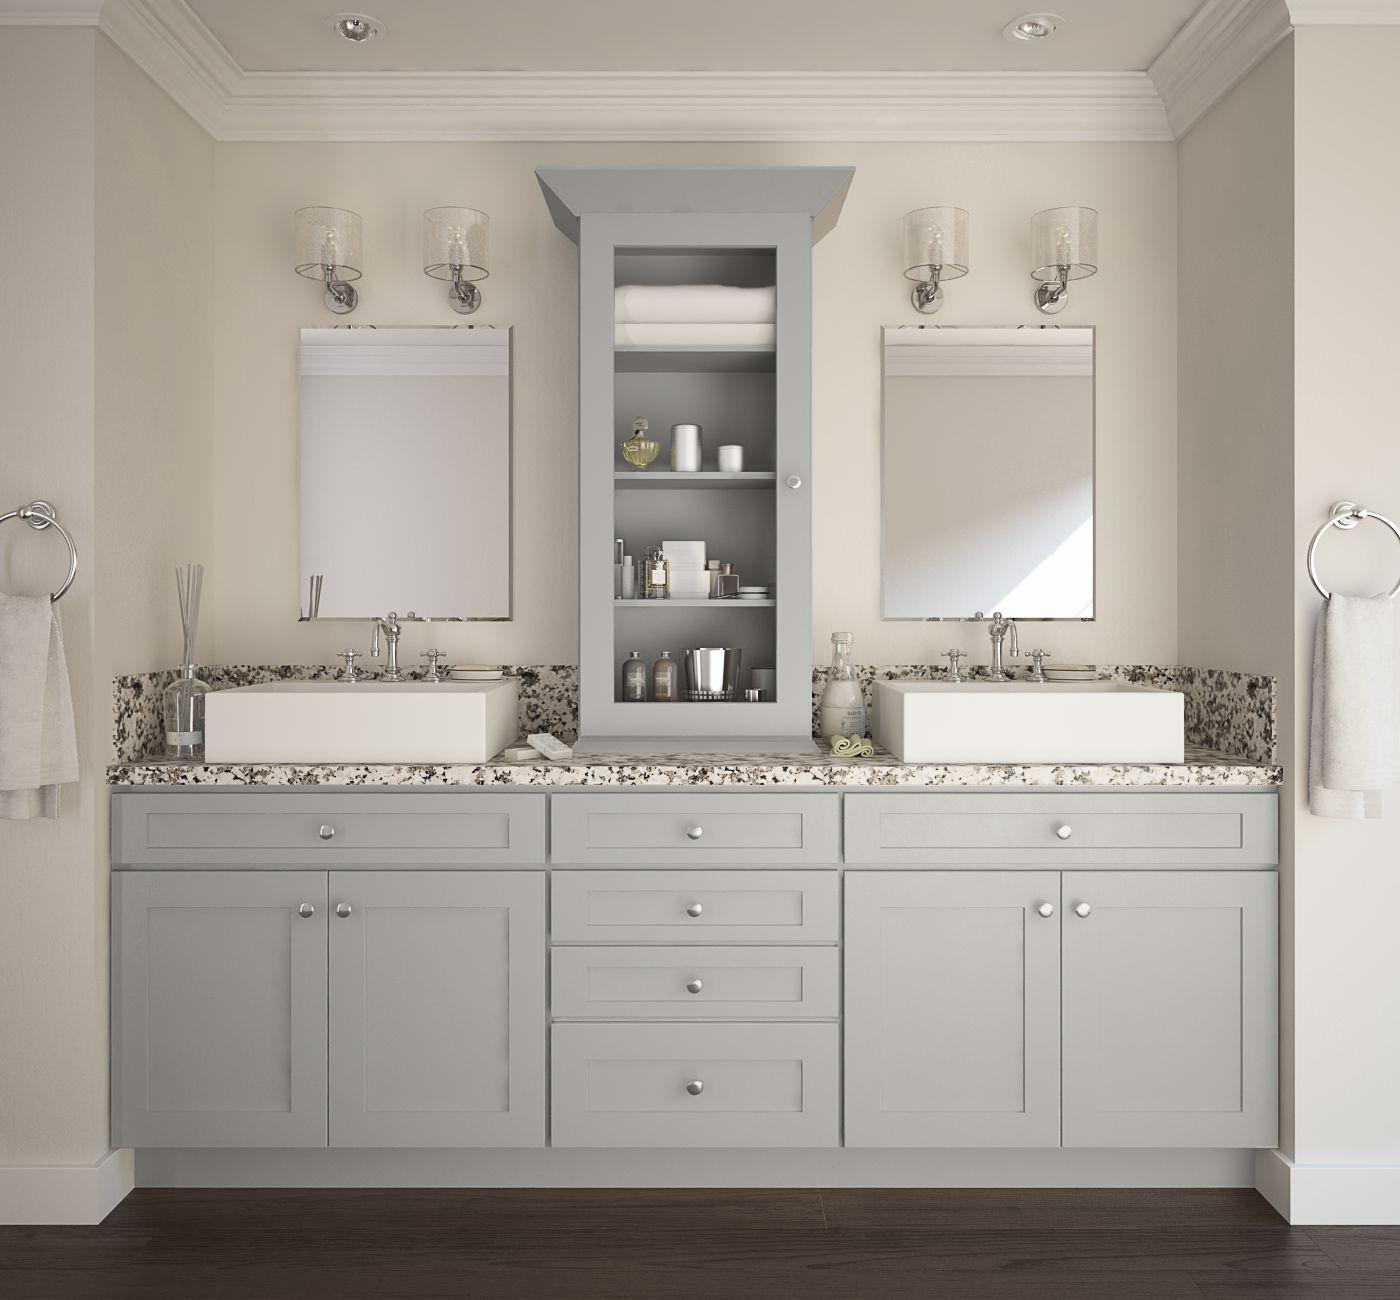 Kitchen Vanity Cabinets: Society Shaker Dove Gray Pre-Assembled Bathroom Vanities